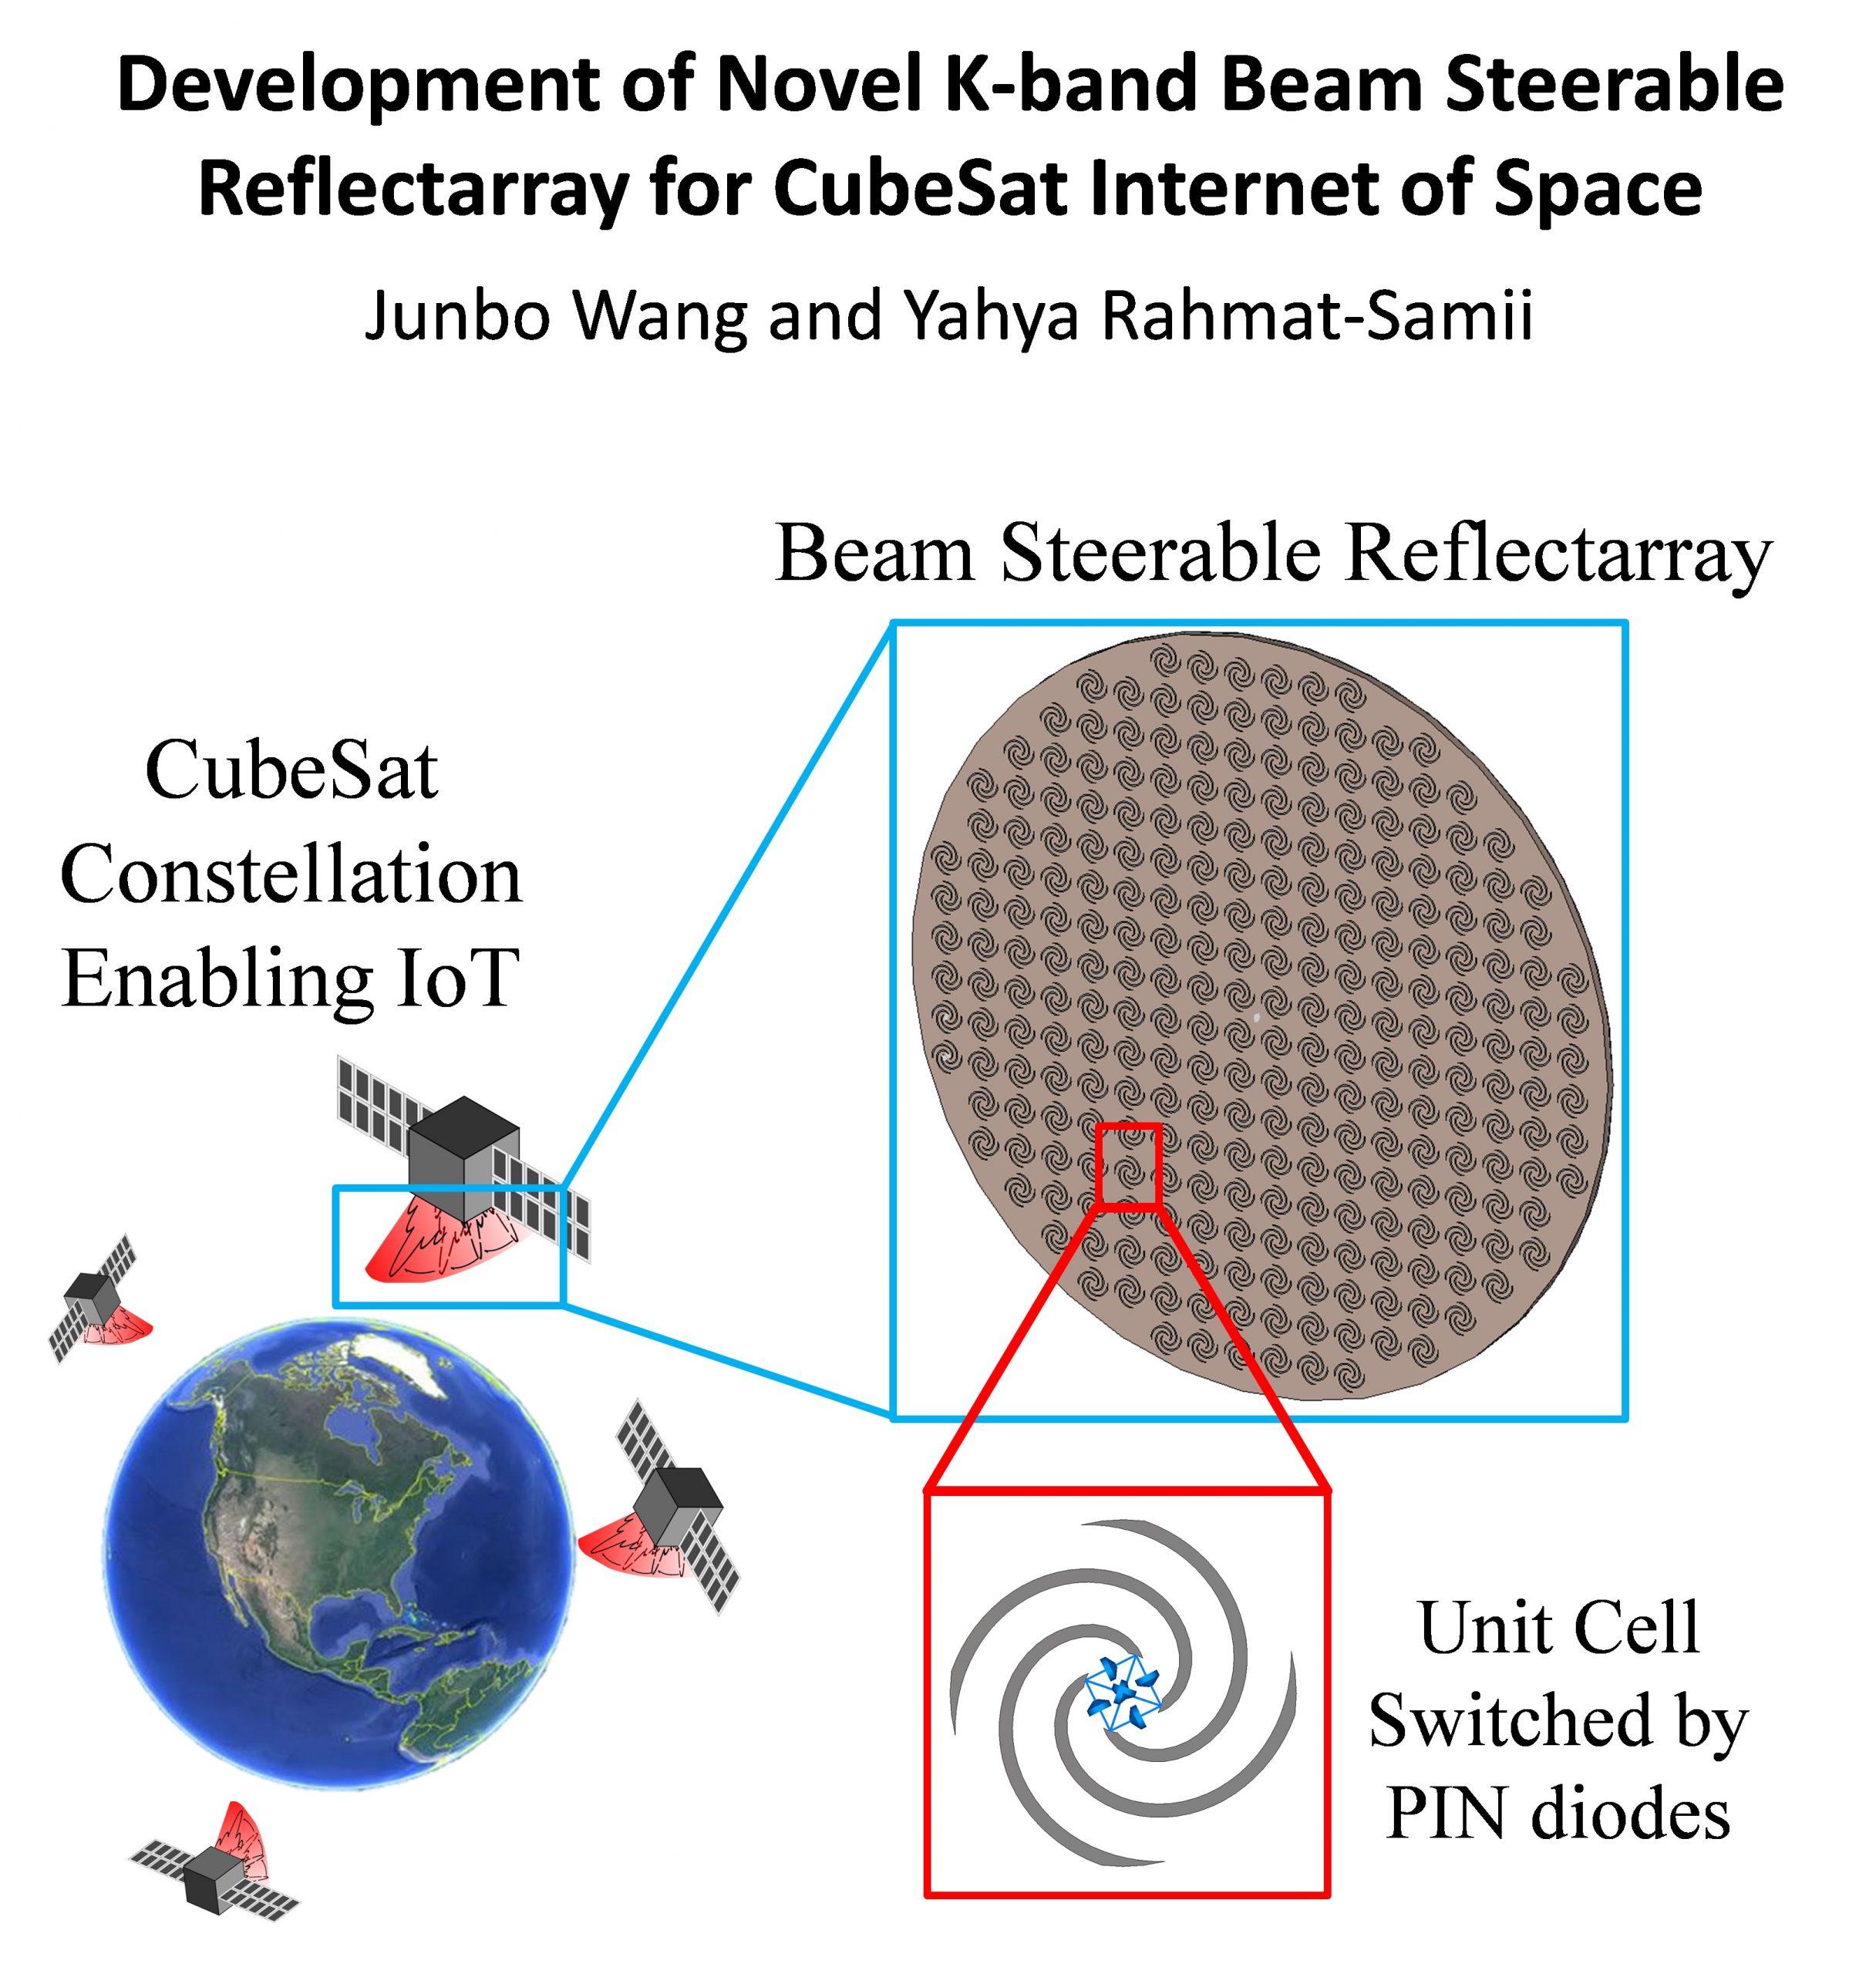 Development of Novel K-band Beam Steerable Reflectarray for CubeSat Internet of Space